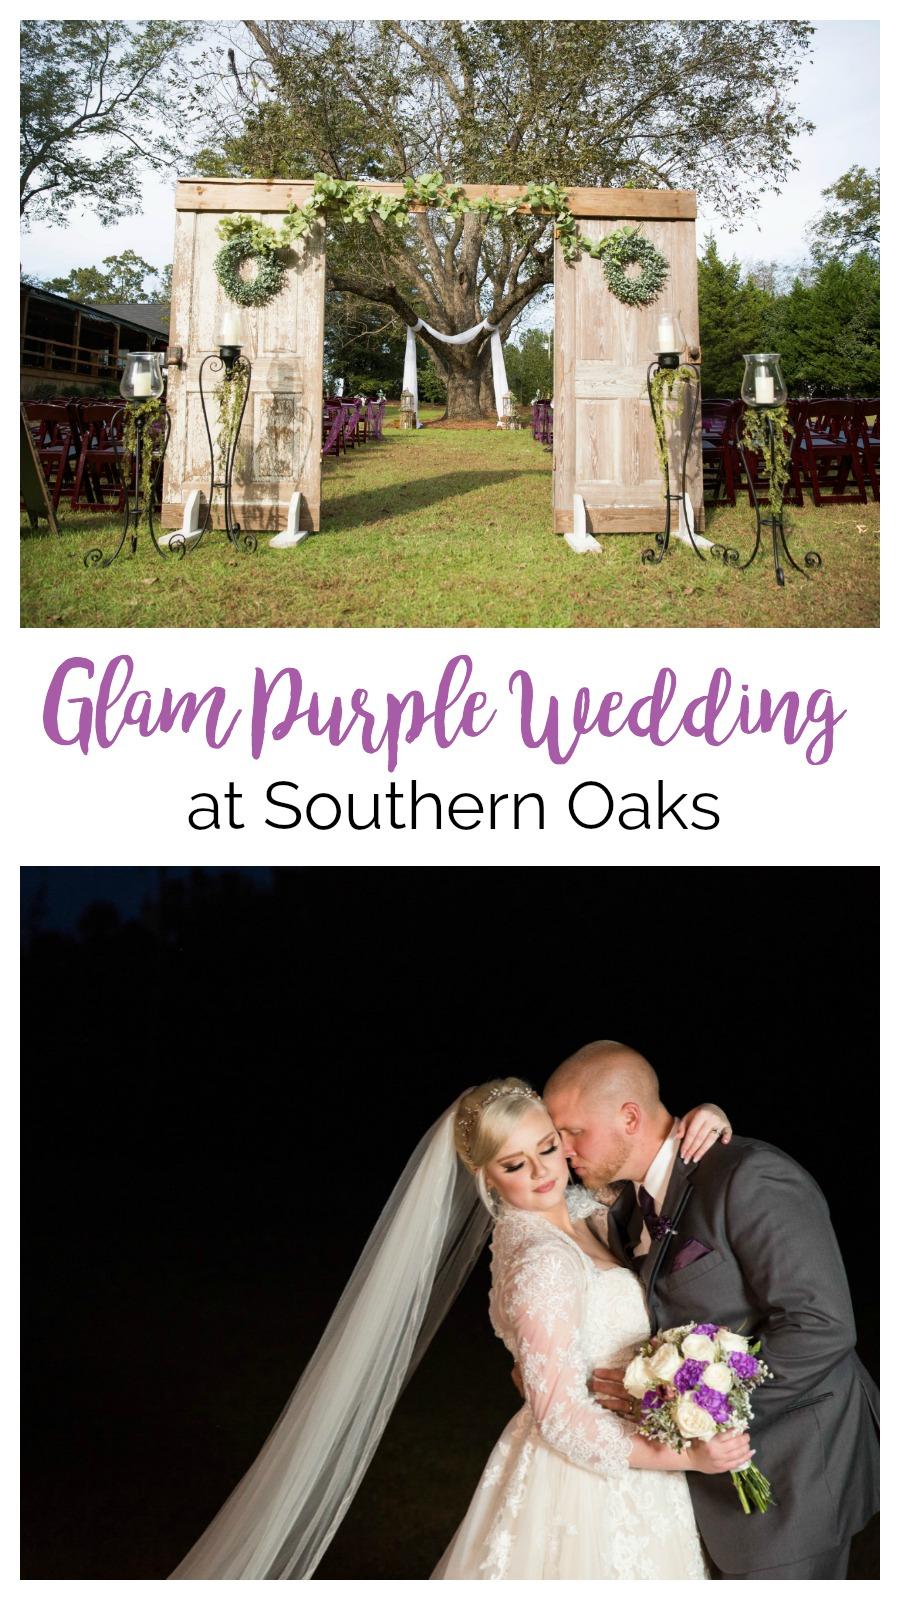 Faithe + Greg: Glam Purple Wedding at Southern Oaks, Gilbert, South Carolina | Palmetto State Weddings | Nikki Morgan Photography | farm wedding